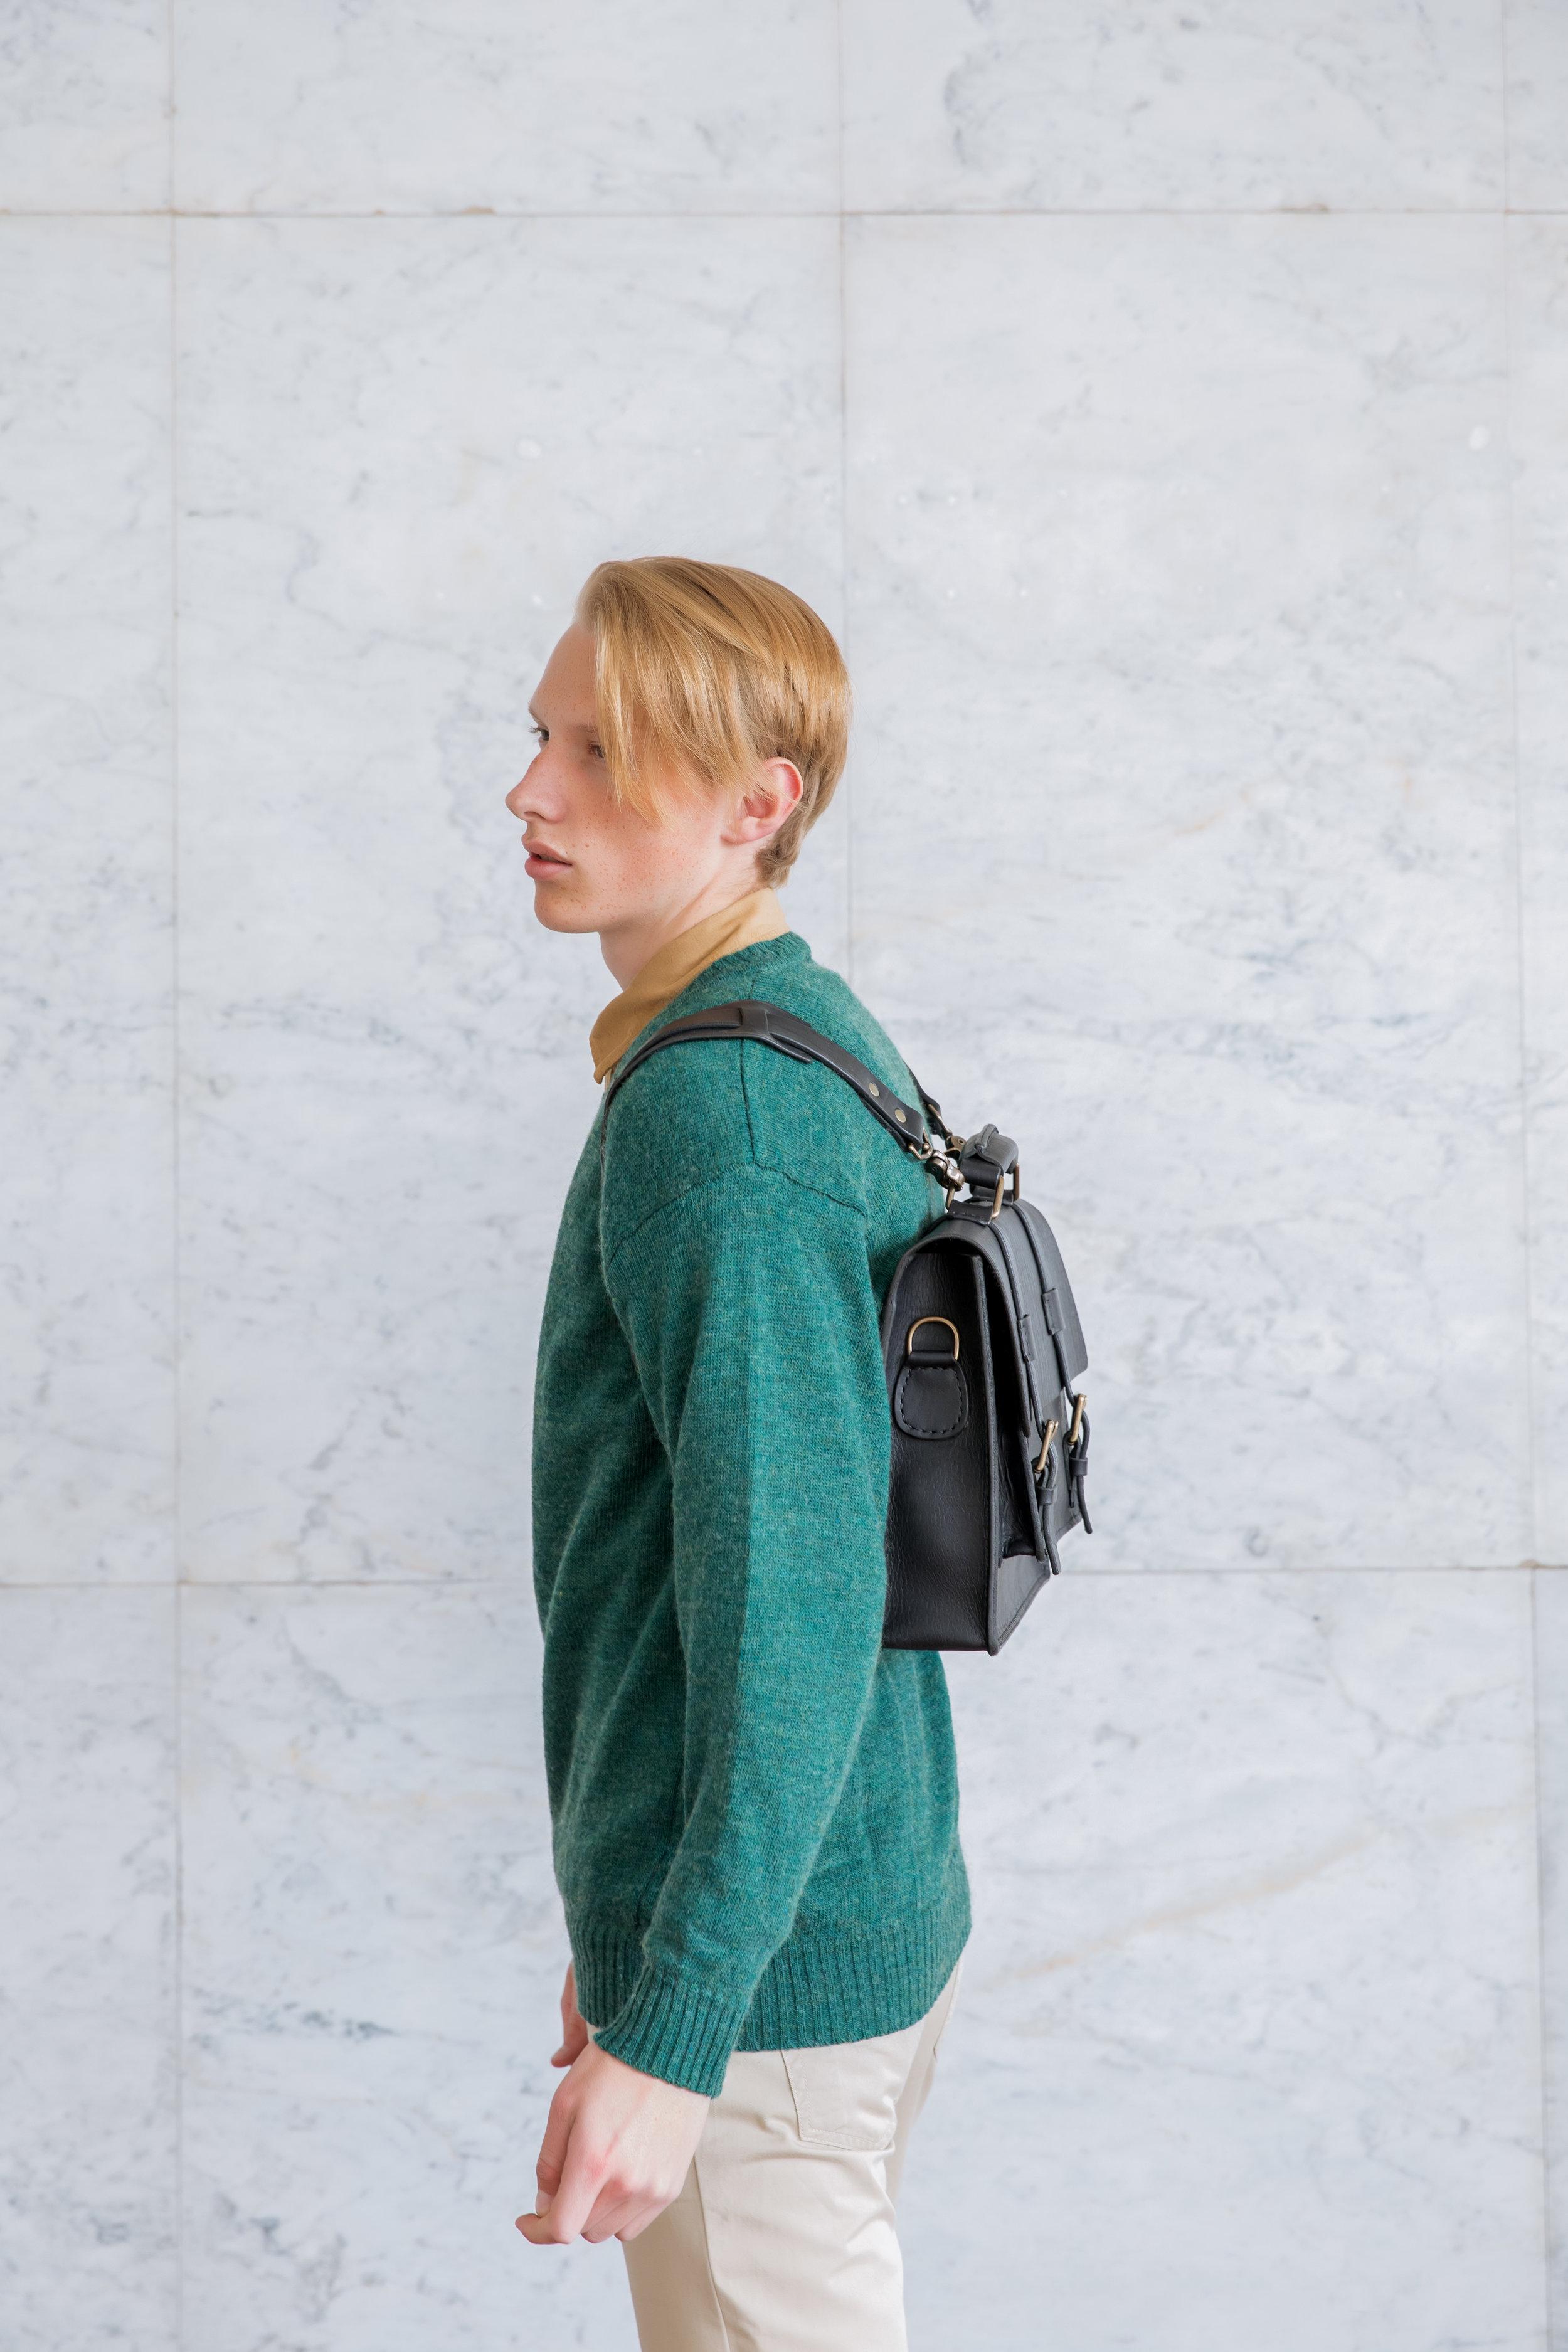 Convertible messenger bag on boy